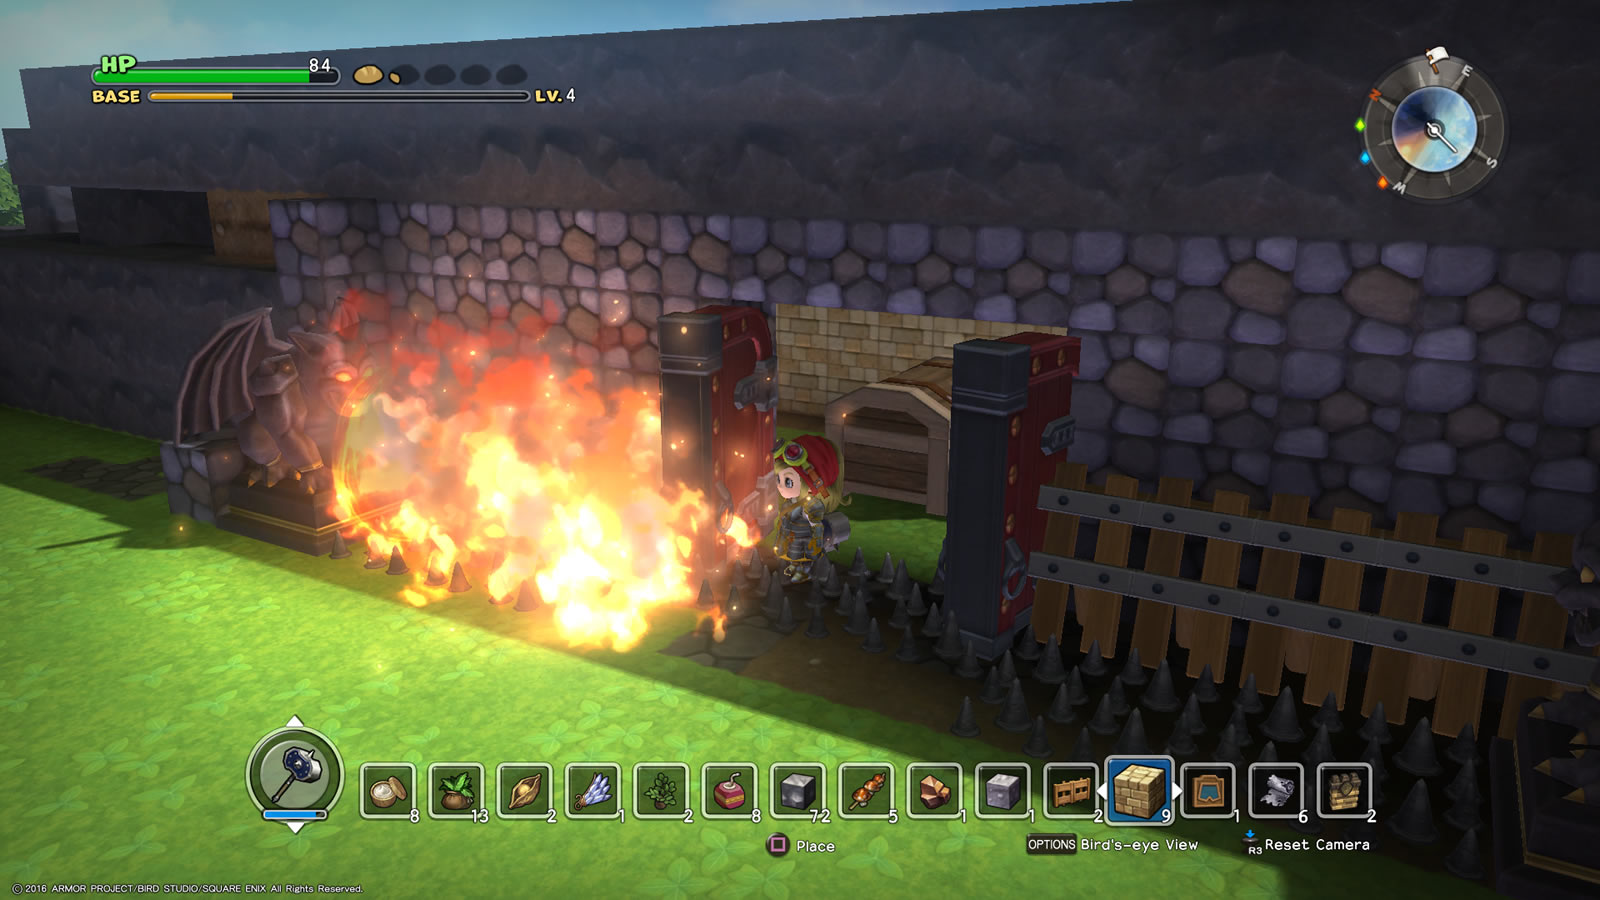 dragon-quest-builders-ps4-review-04